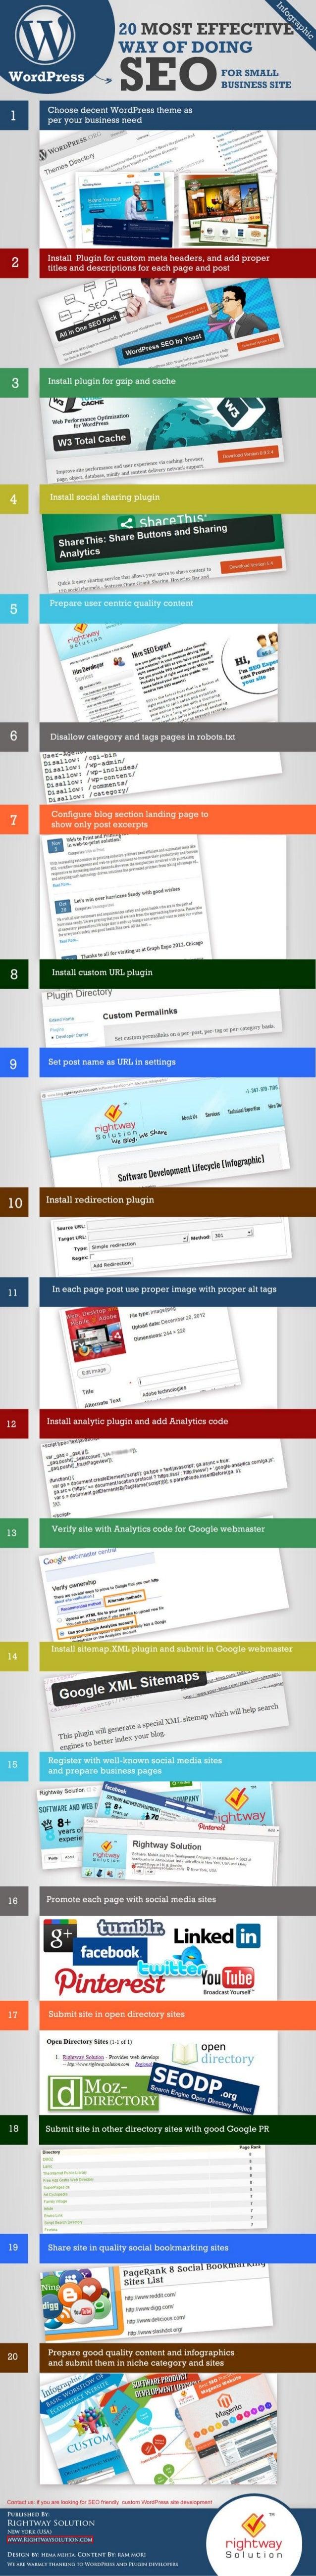 Effective SEO tips for WordPress site